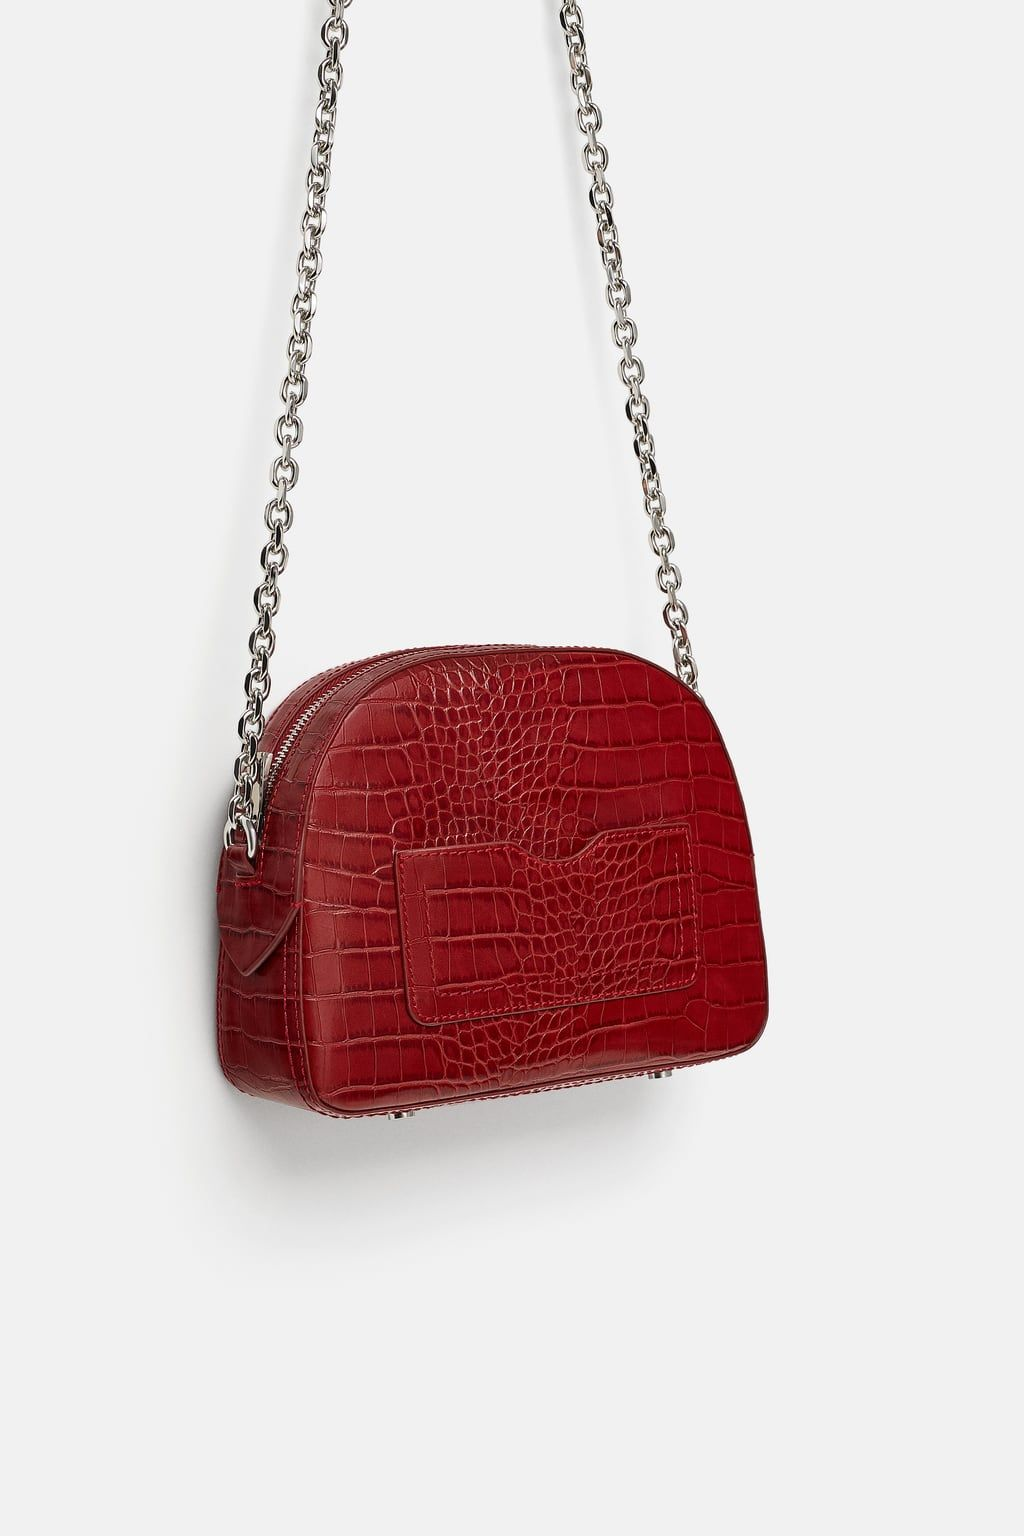 ea5c9a71344c5 EMBOSSED ANIMAL PRINT CROSSBODY BAG from Zara